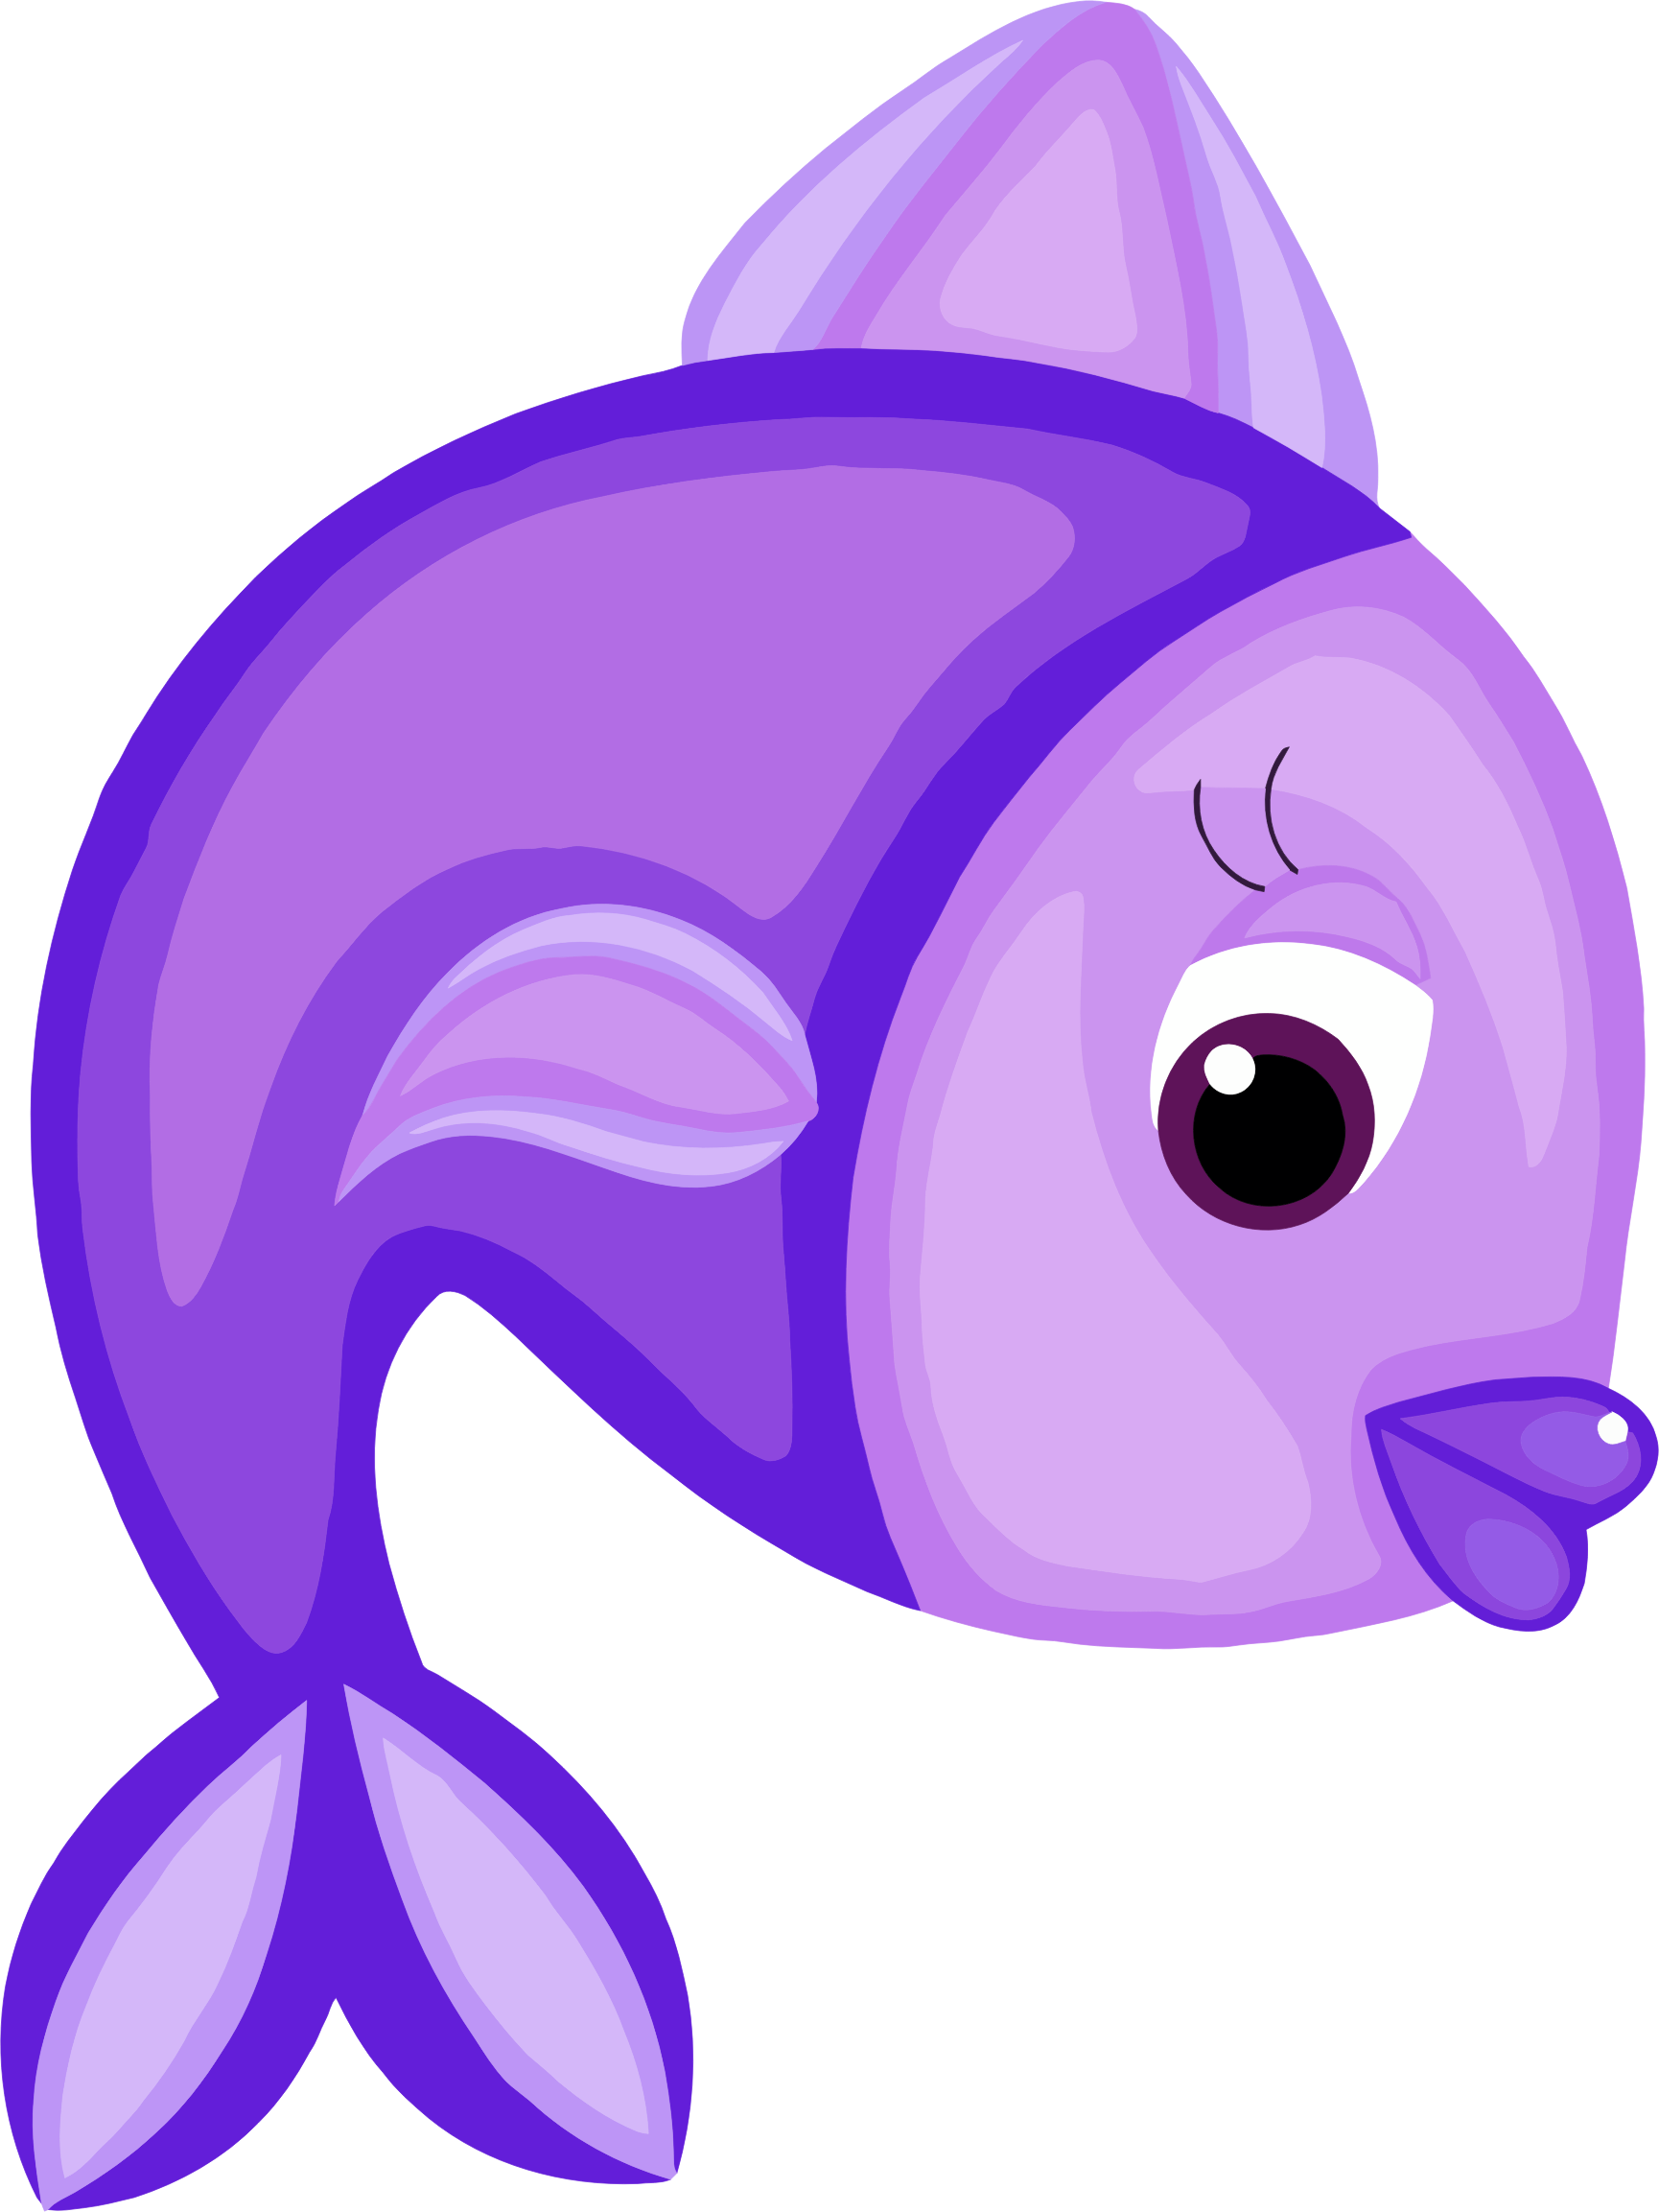 Fish clipart purple, Fish purple Transparent FREE for